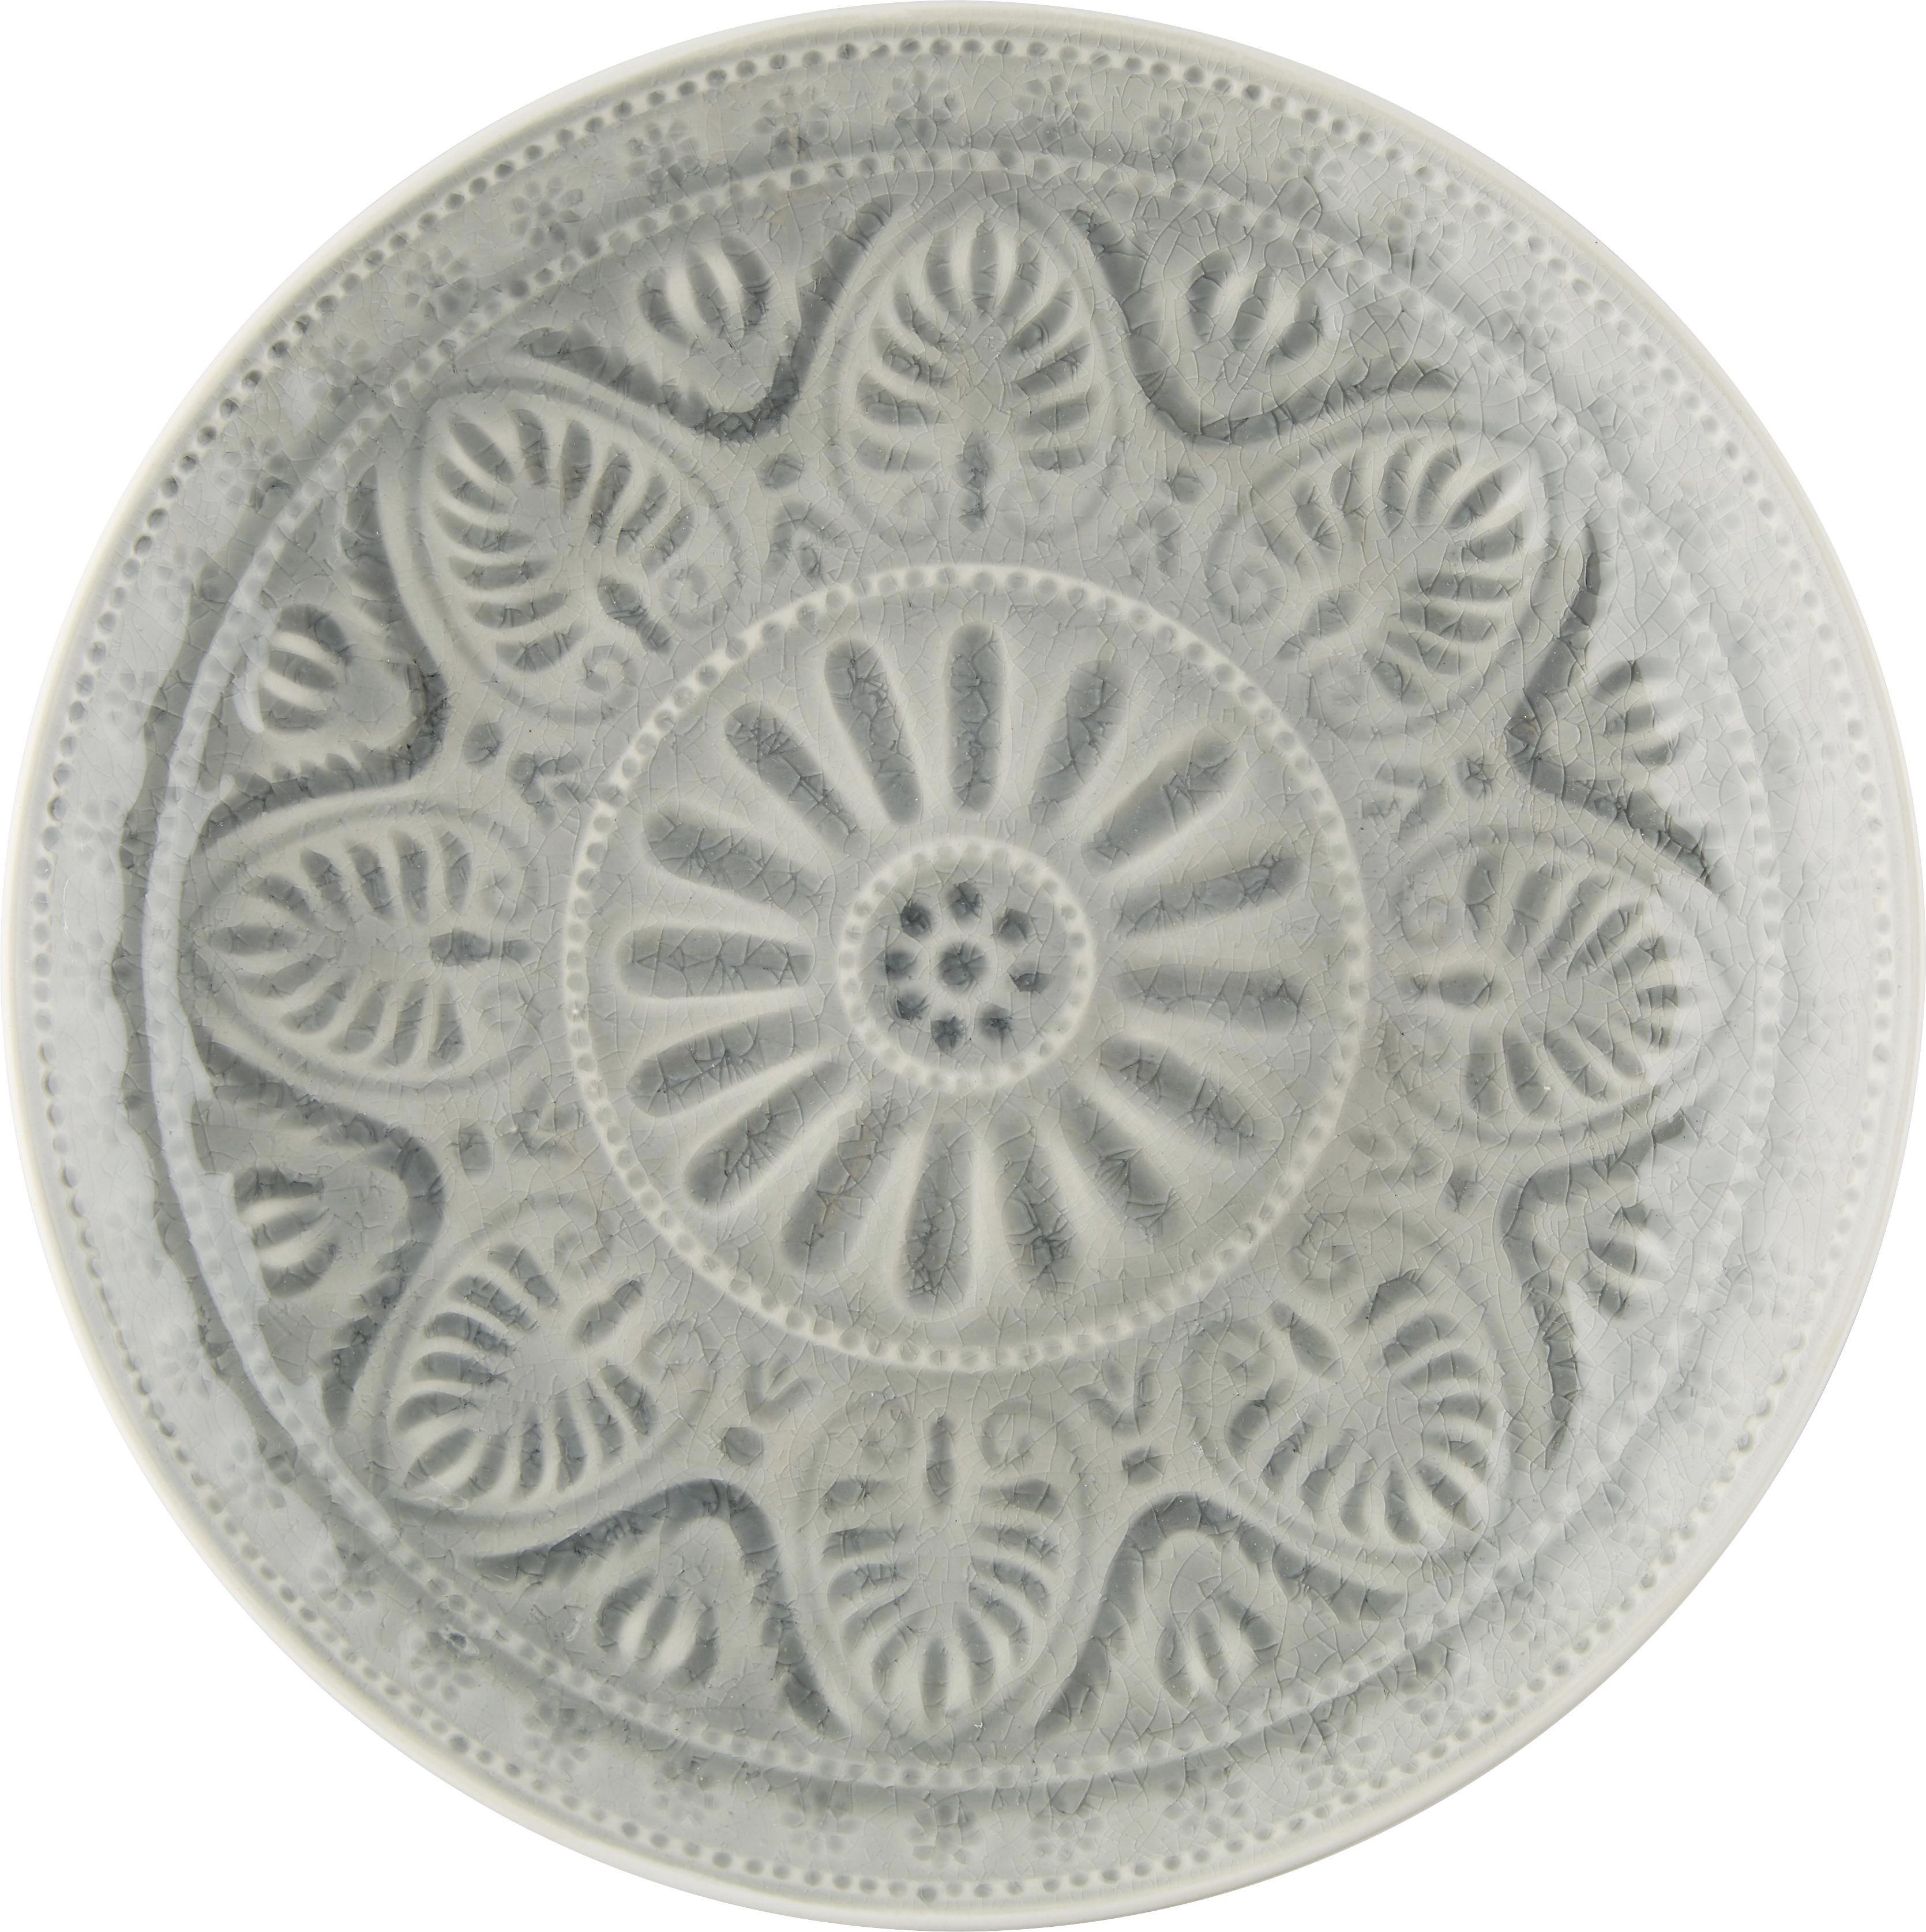 Speiseteller Panja aus Keramik in Grau - Grau, LIFESTYLE, Keramik (26,5/4cm) - MÖMAX modern living